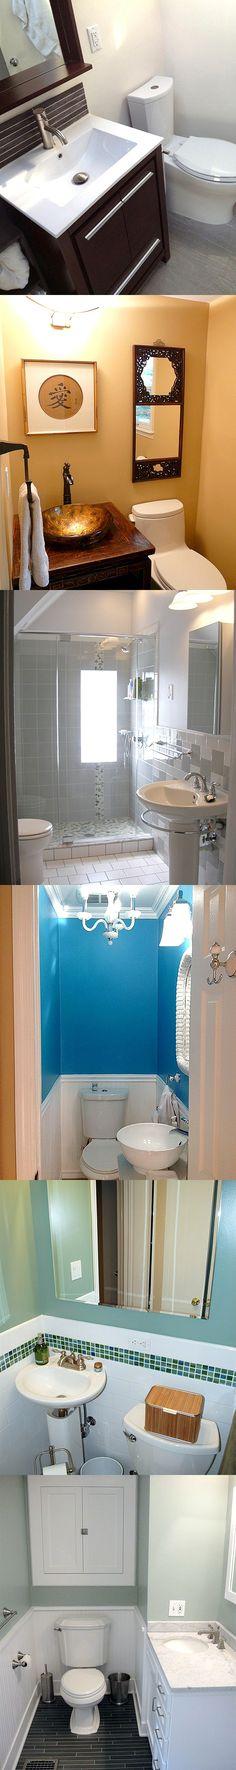 Design ideas - small bathroom spaces